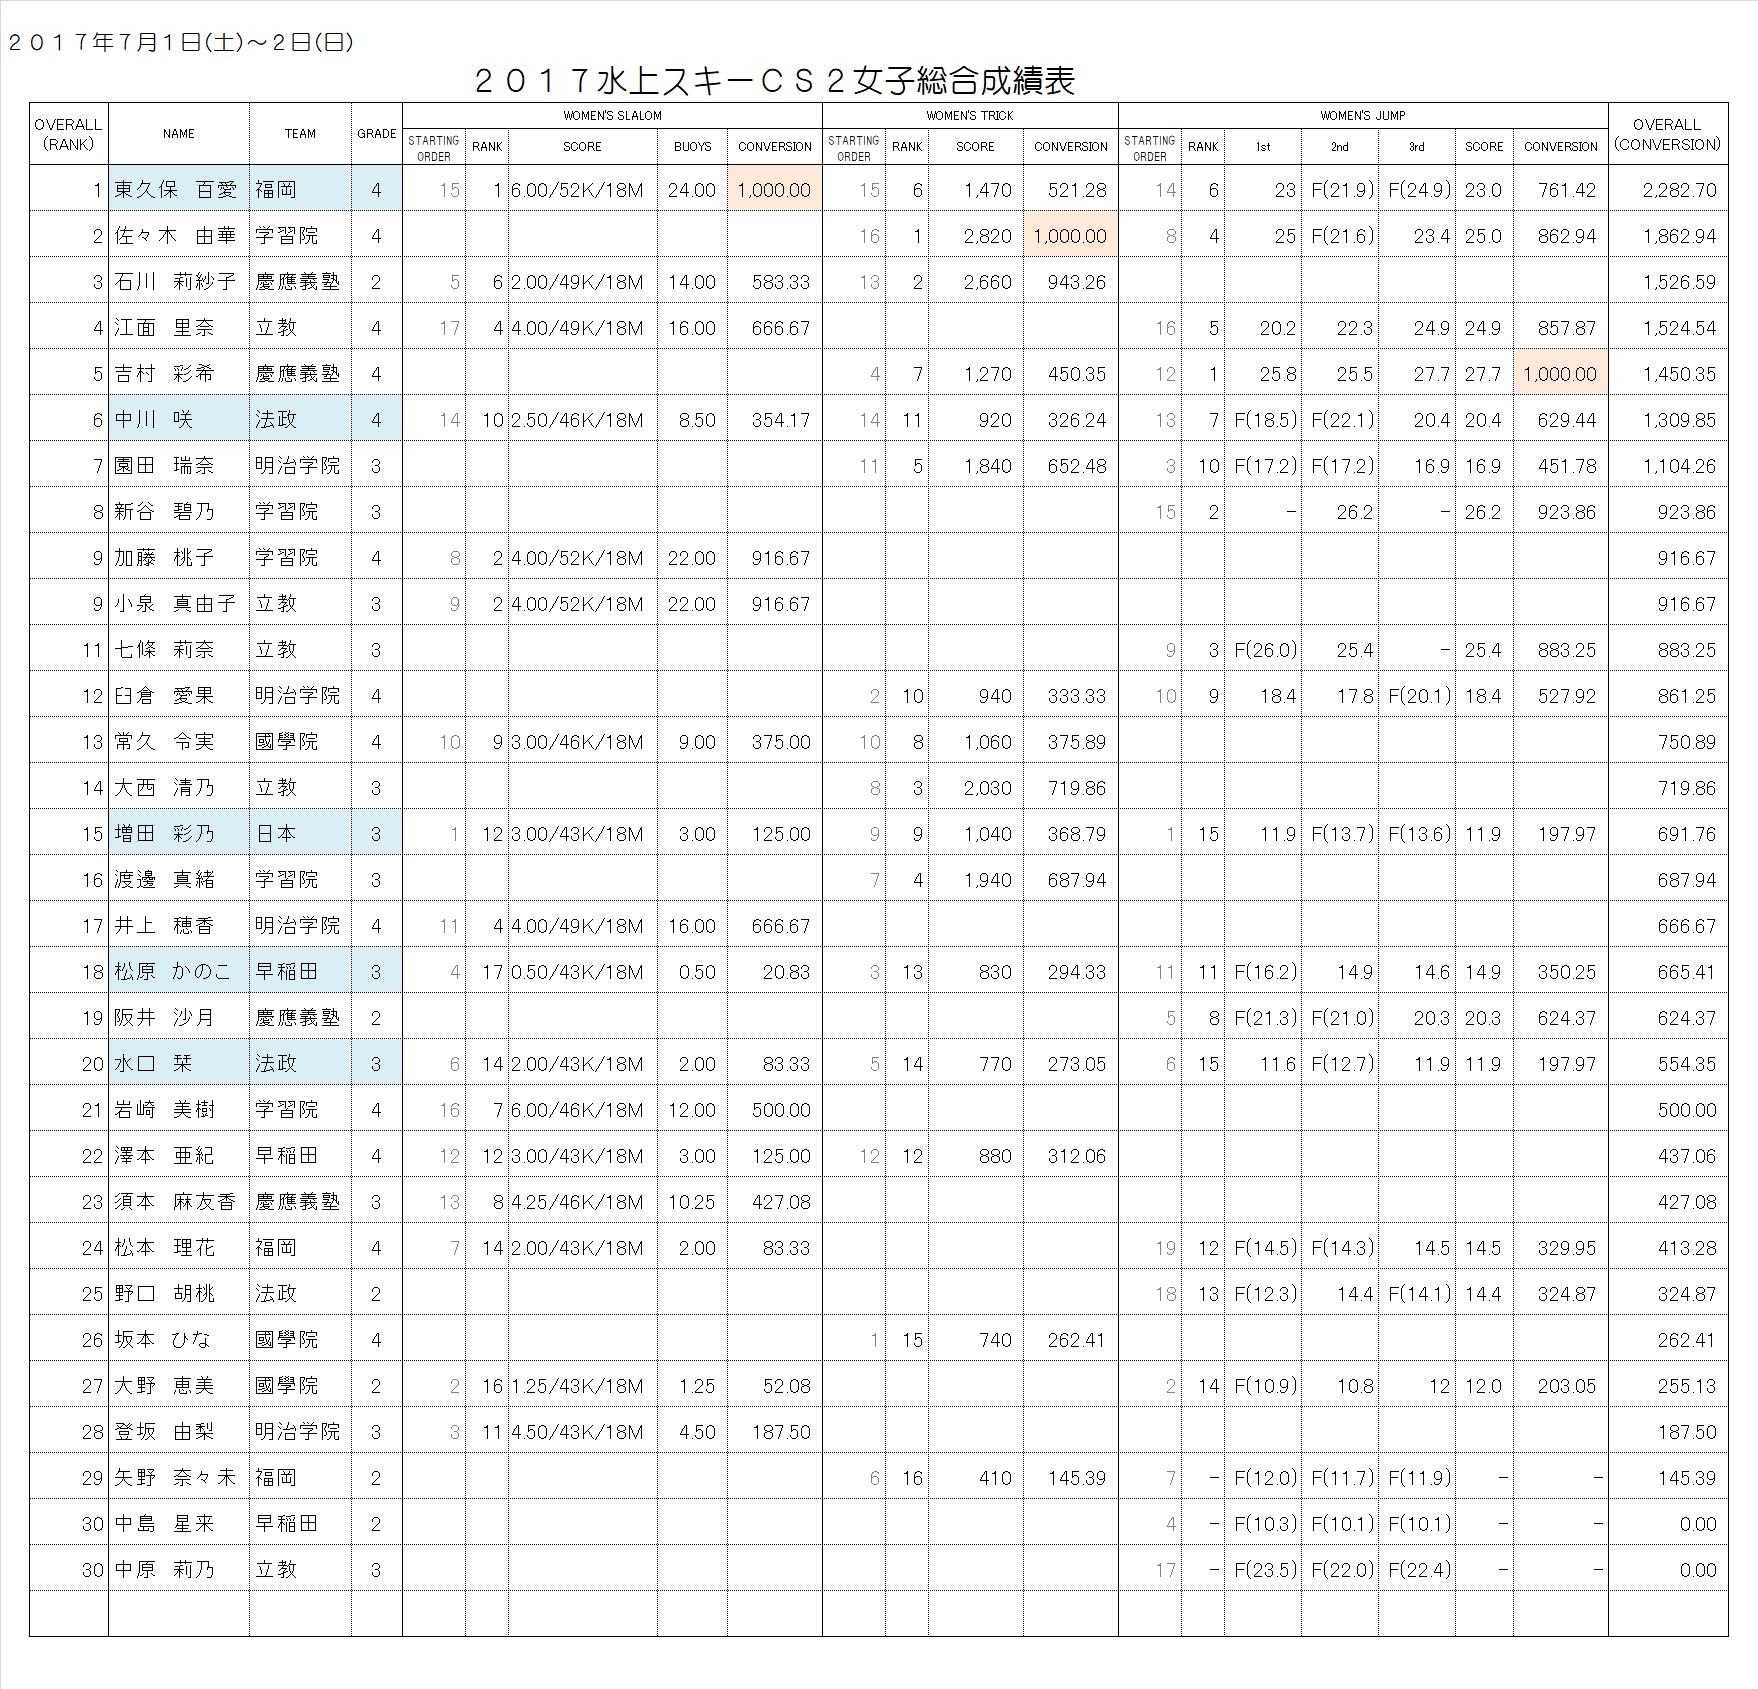 2017CS2 Women's Overall Result